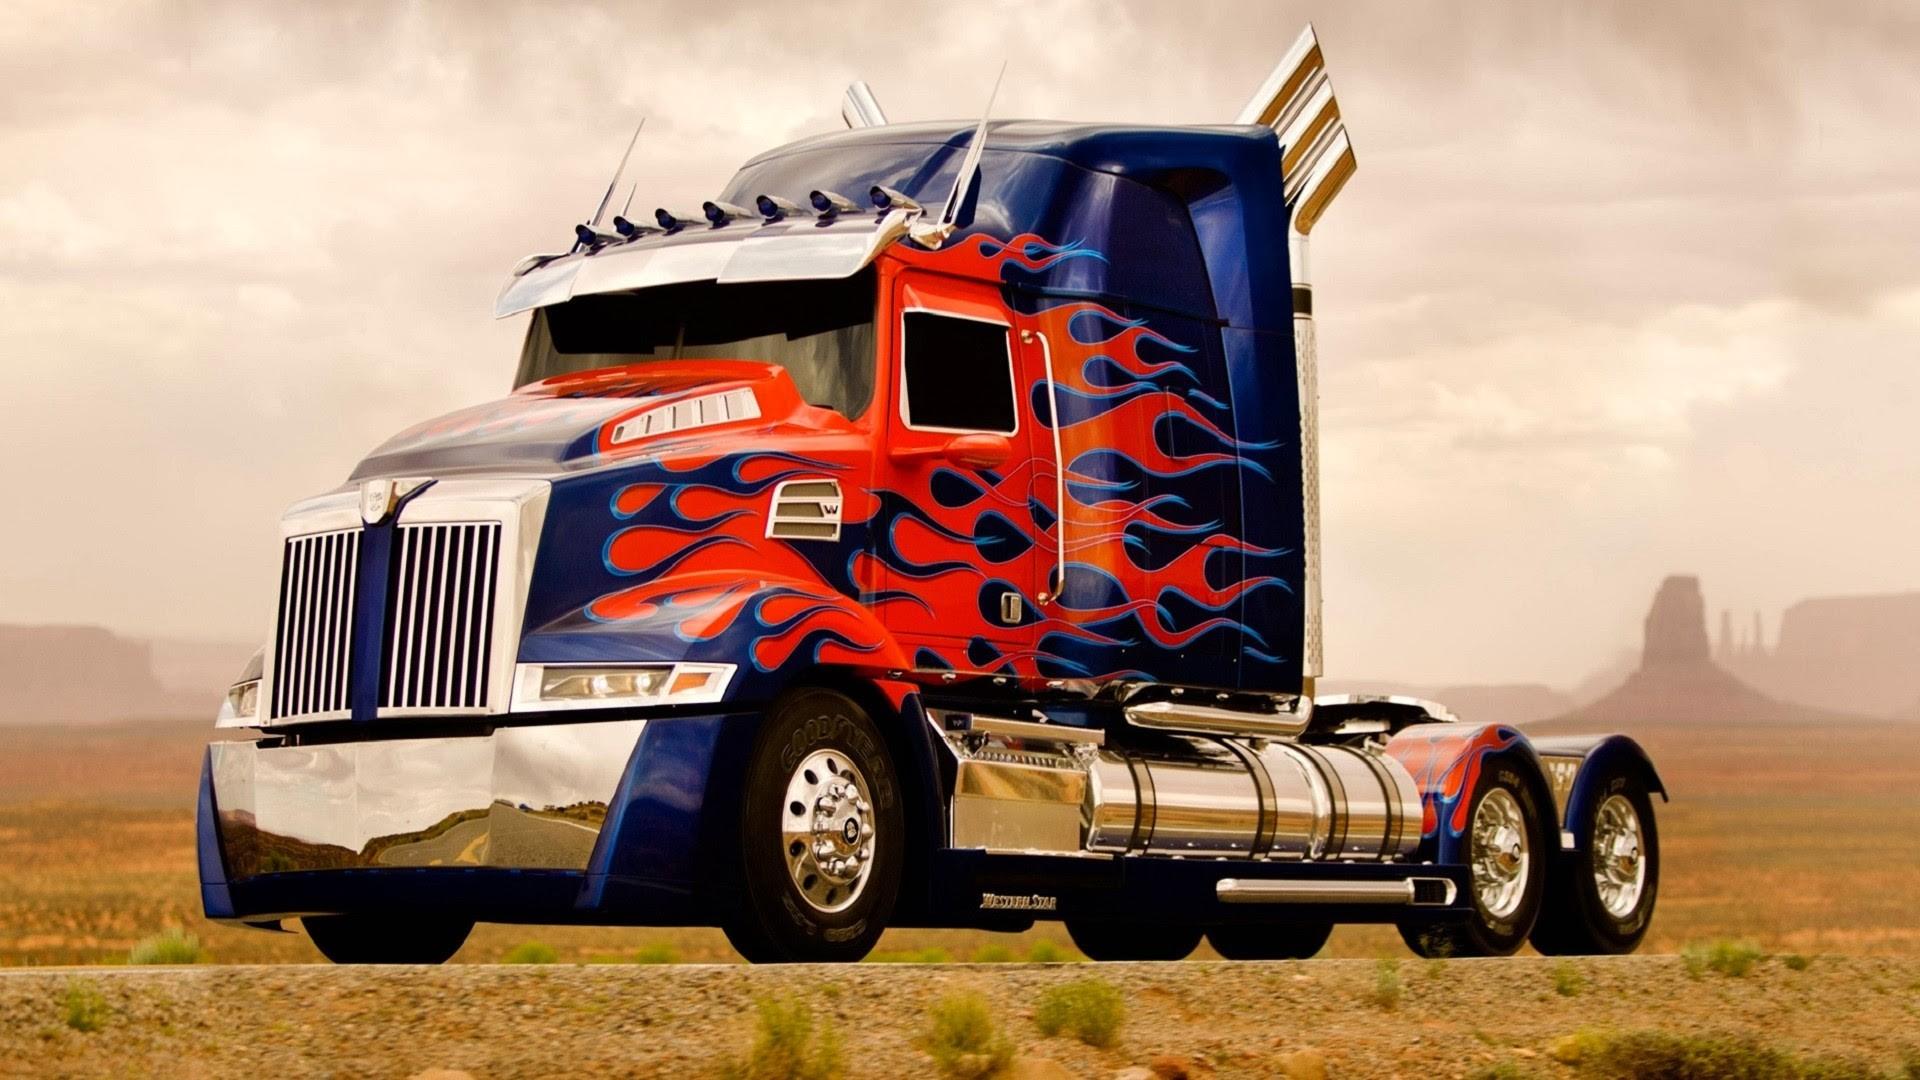 optimus prime transformer 4 age of extinction 2014 movie hd wallpaper